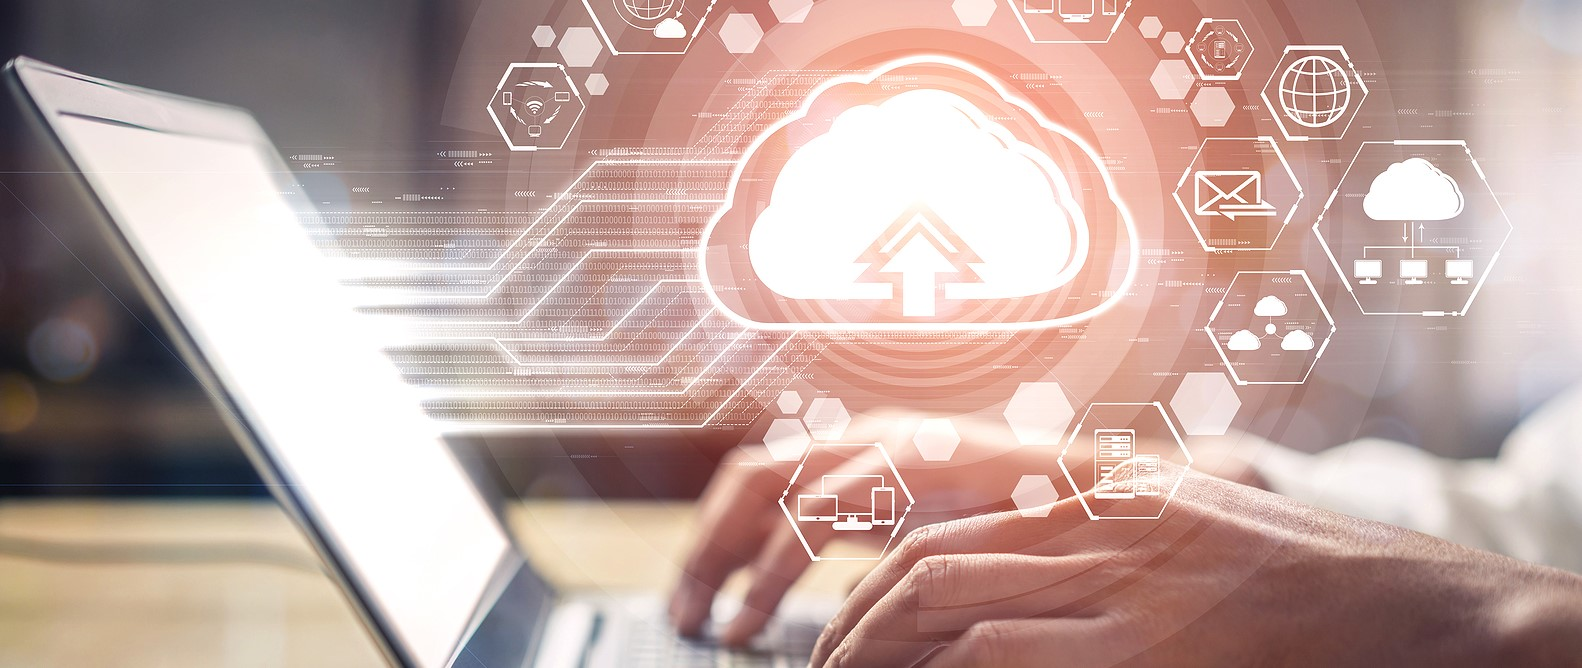 Bigstock Cloud Computing Technology And 3726502331